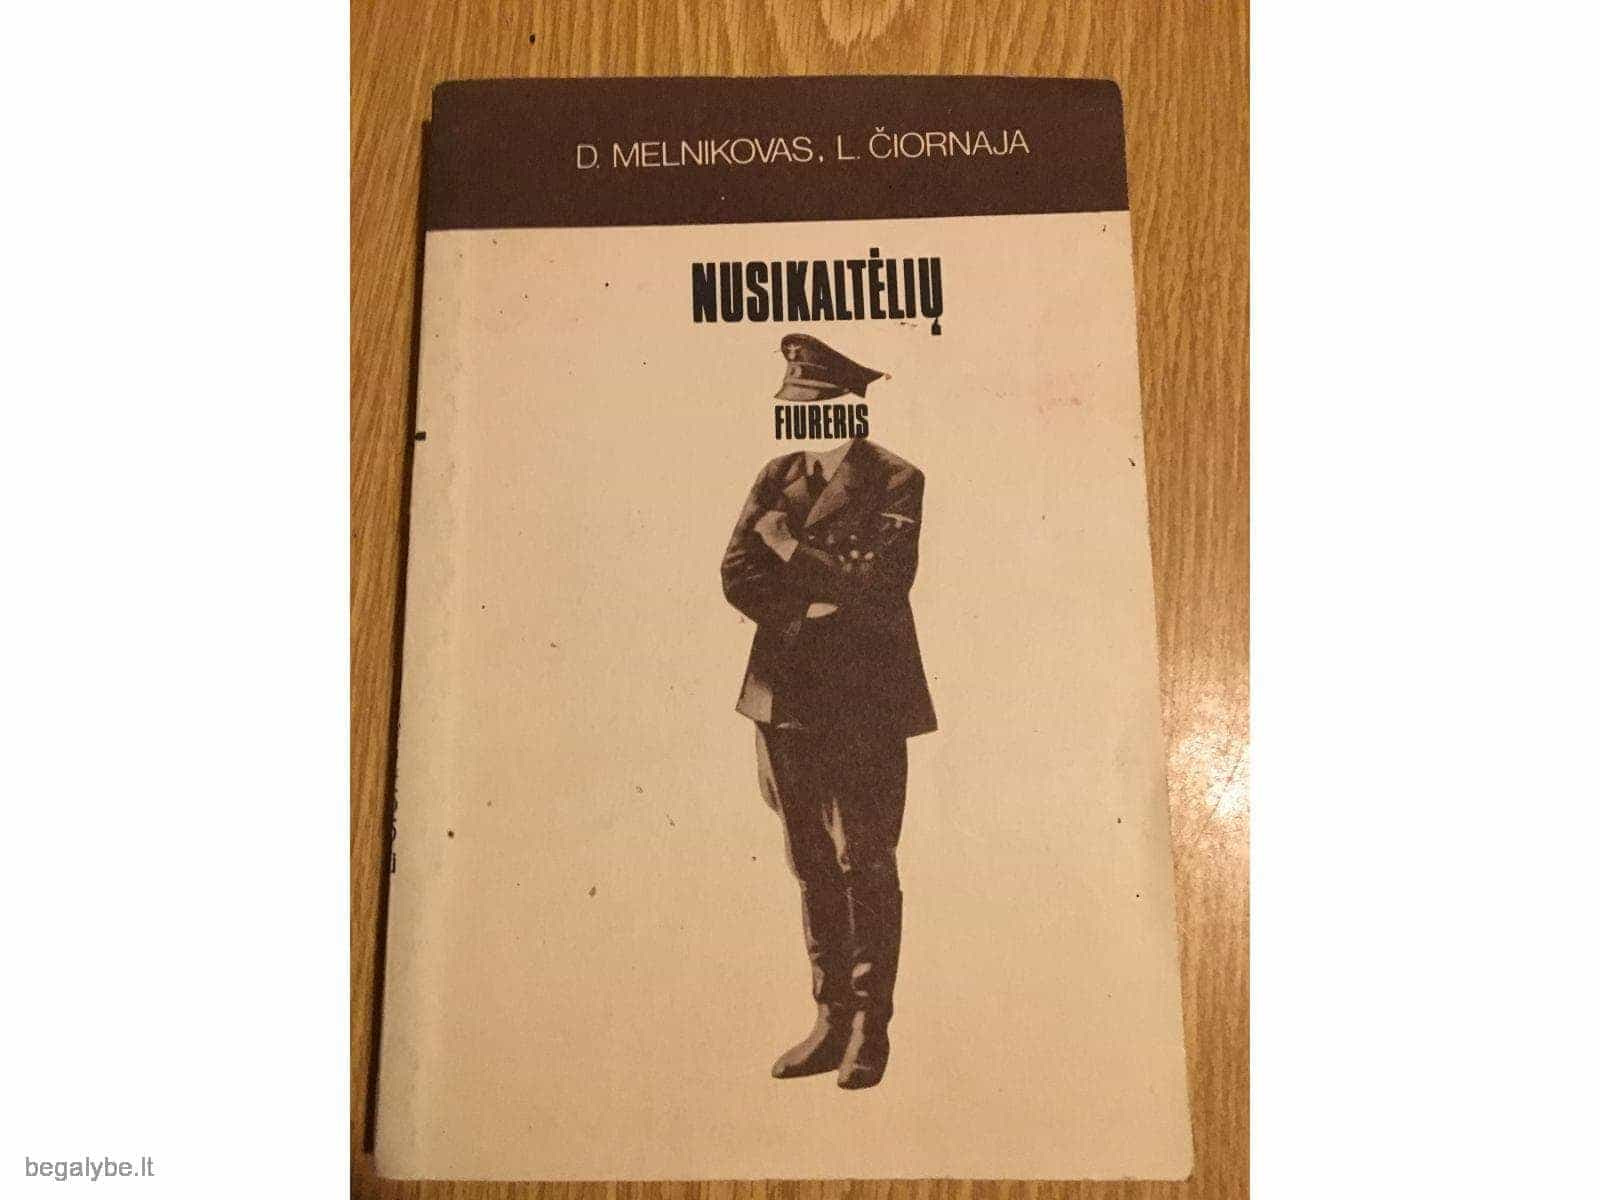 D. Melnikovas, L. Čiornaja -